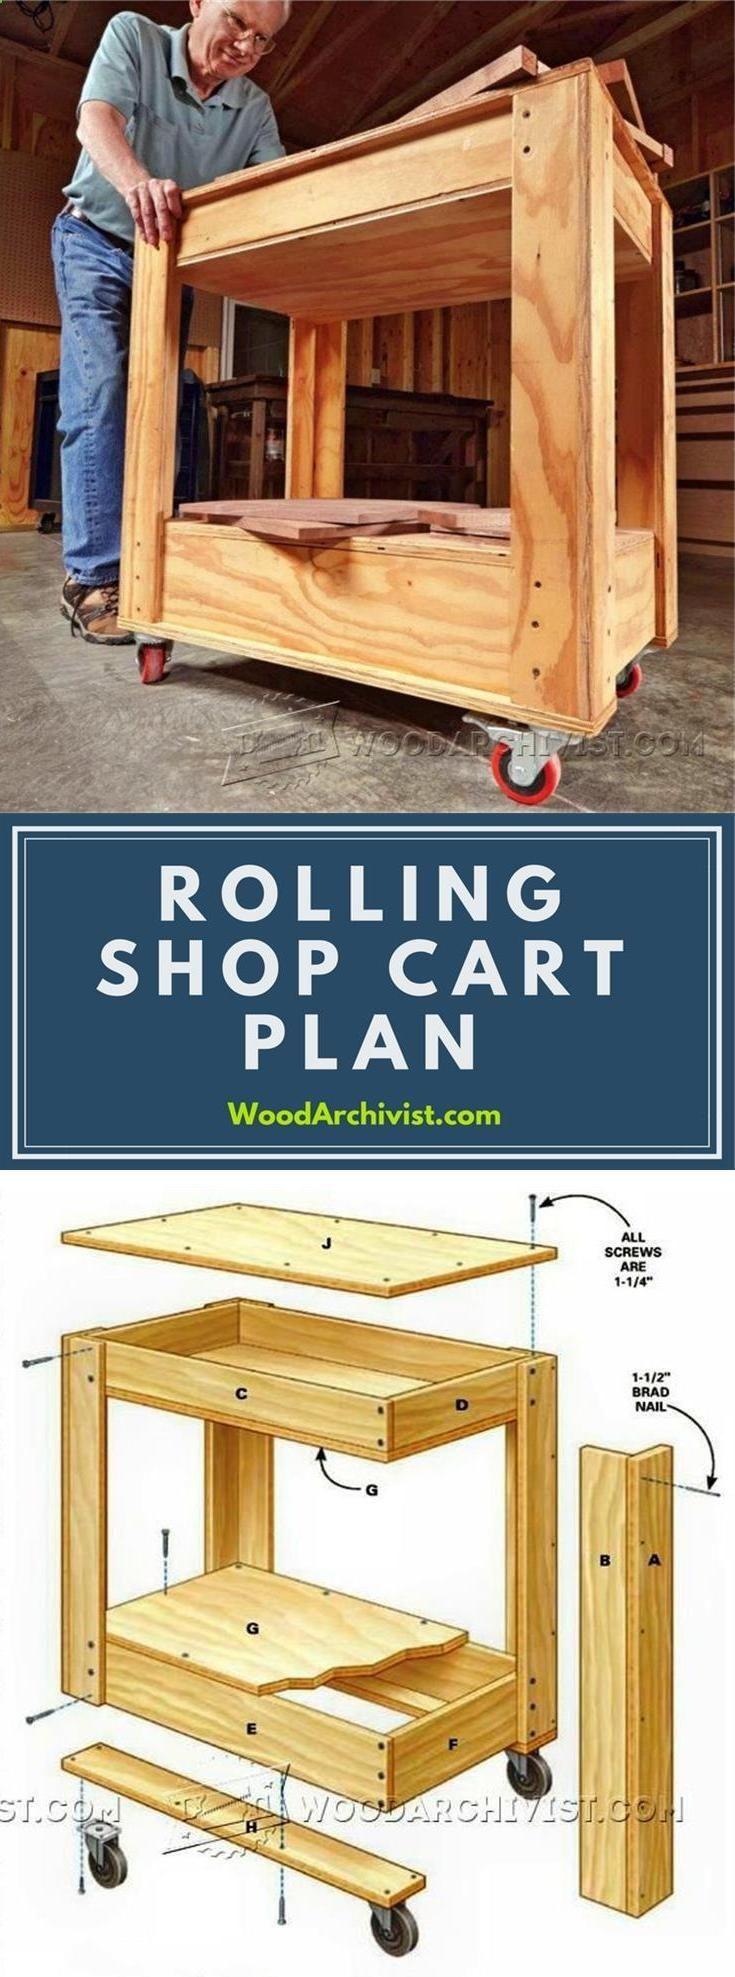 Rolling Shop Cart Plans - Workshop Solutions Projects, Tips and Tricks | WoodArchivist.com